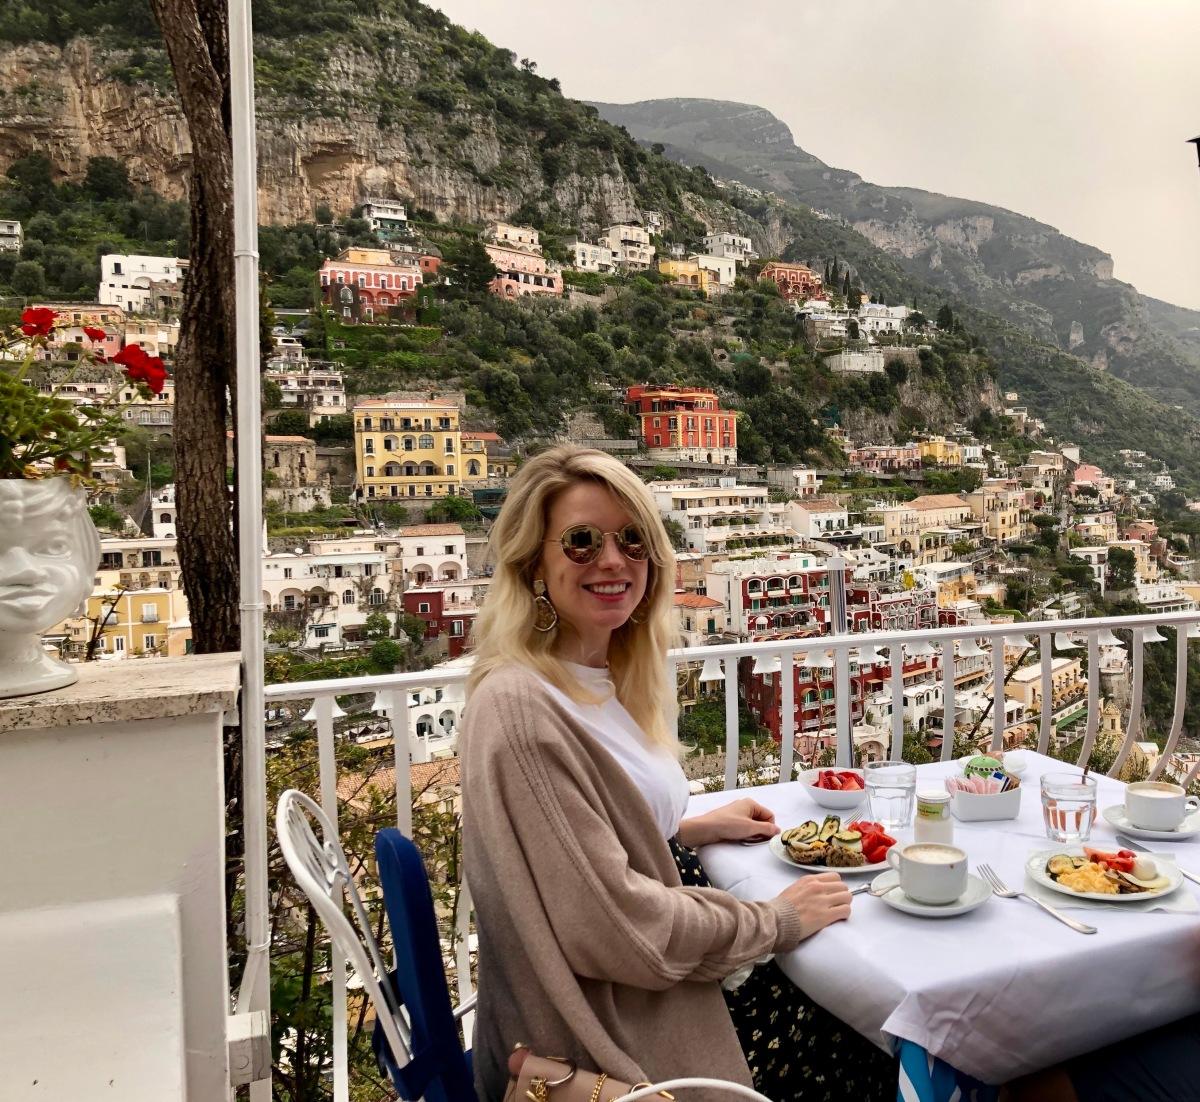 Blonde girl eating breakfast in Positano Italy Amalfi Coast